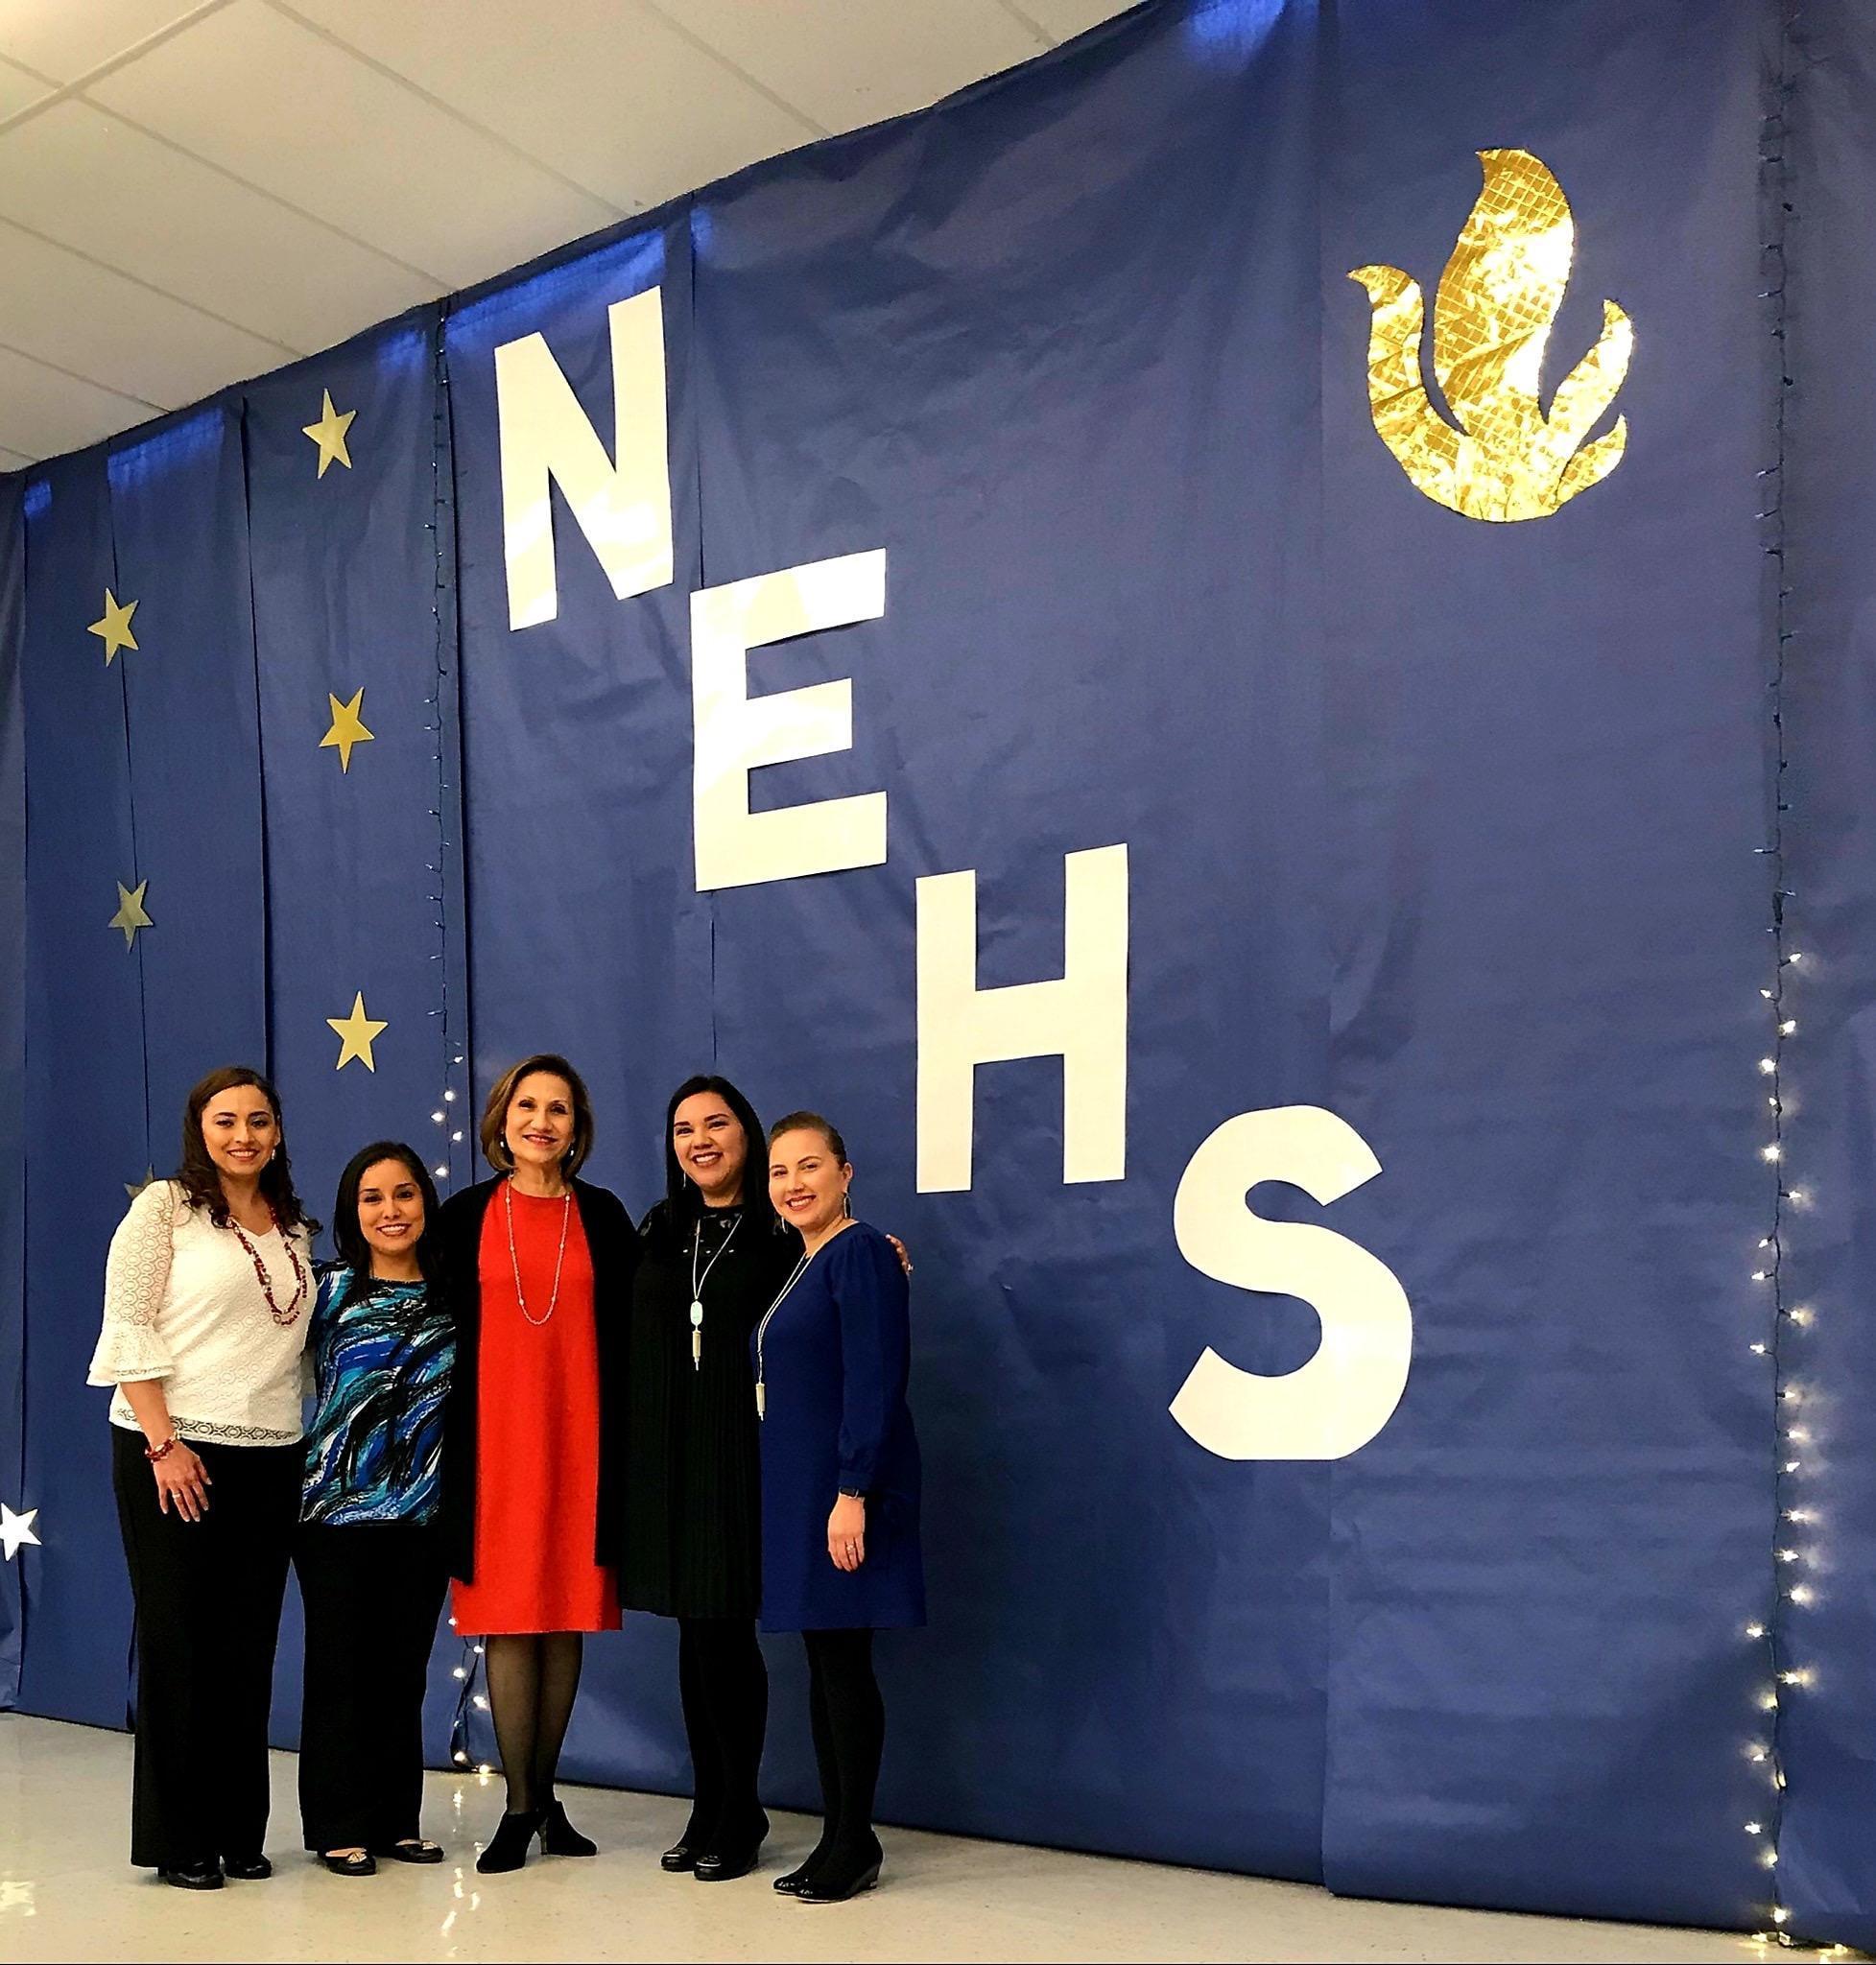 NEHS staff posing